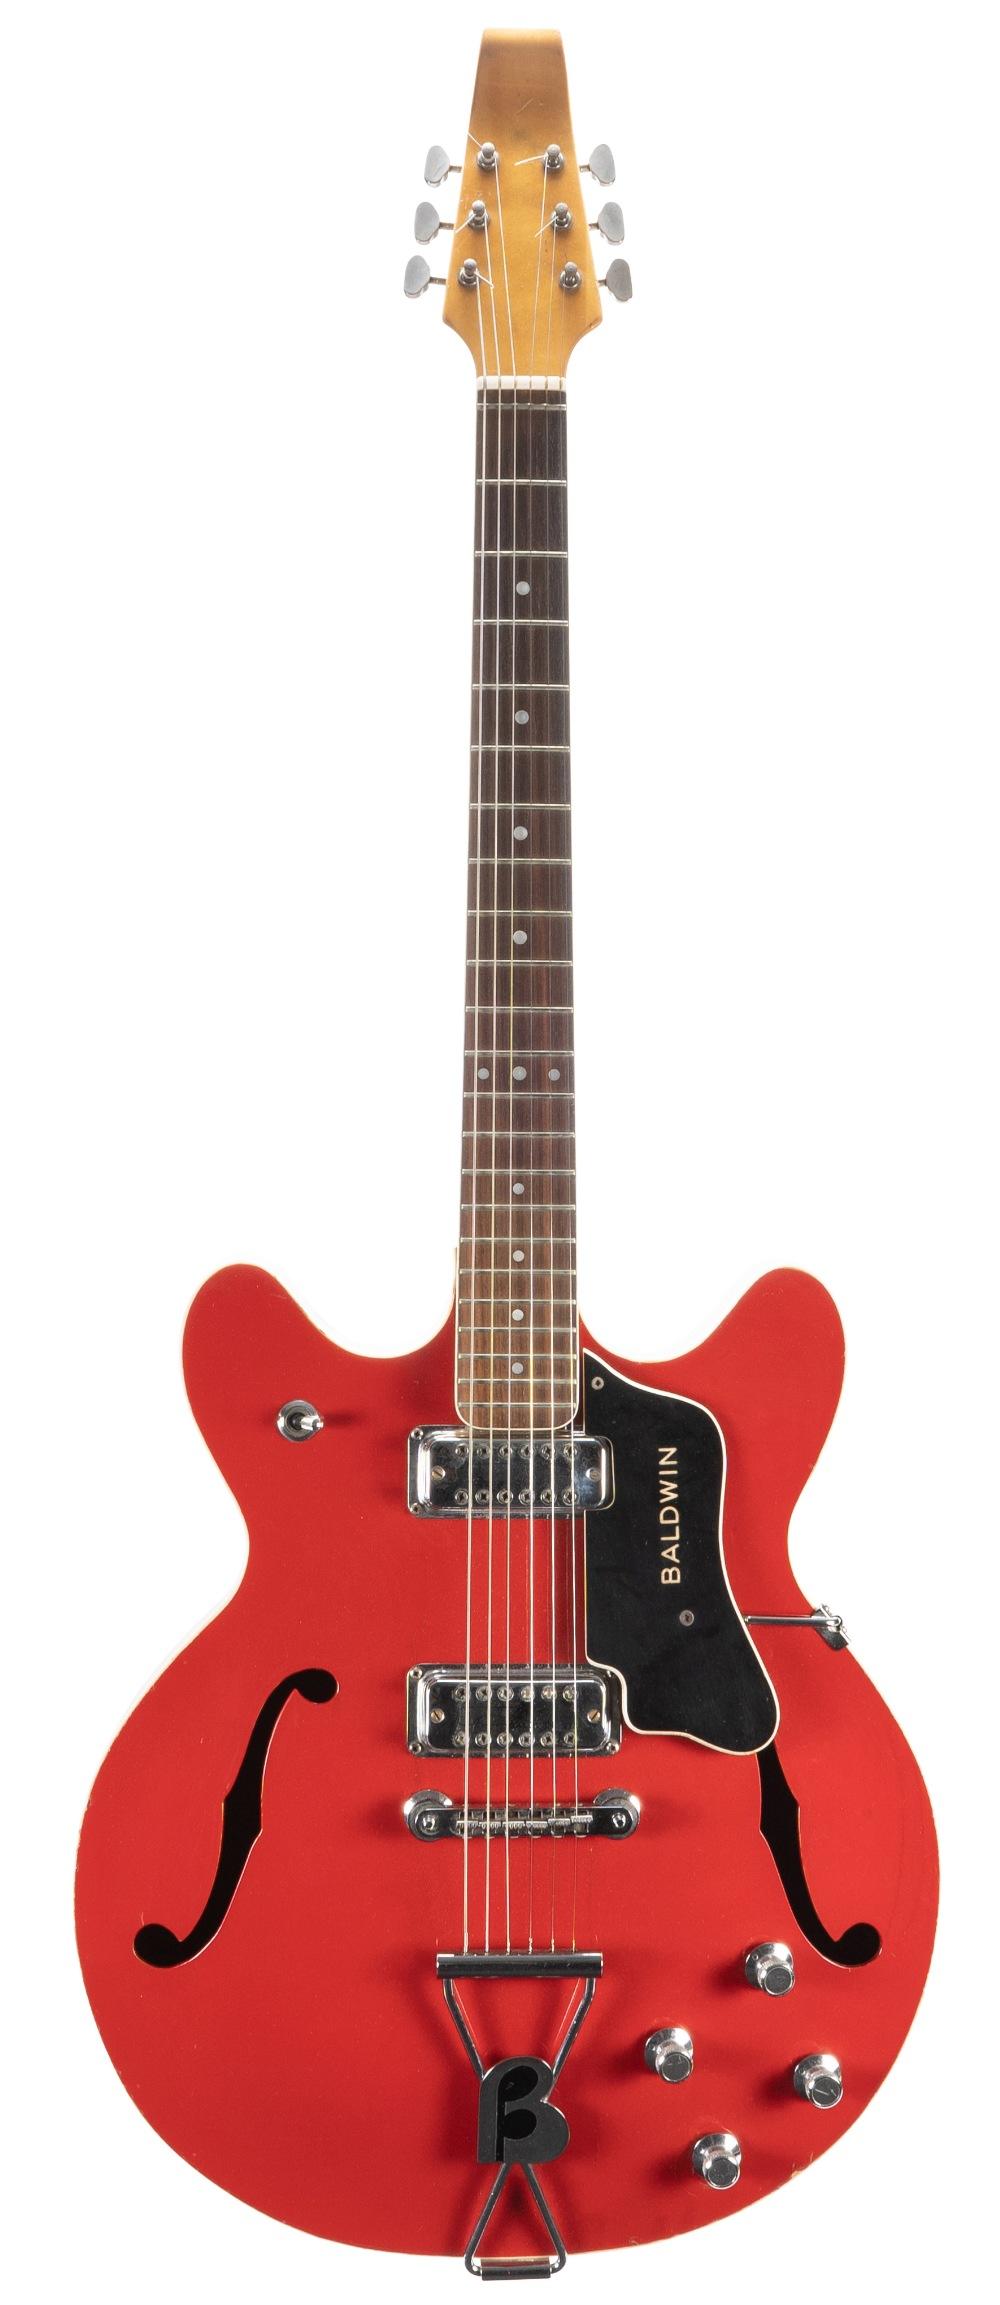 Late 1970s Baldwin 700 Series hollow body electric guitar, made in England, ser. no. 7xxx2;